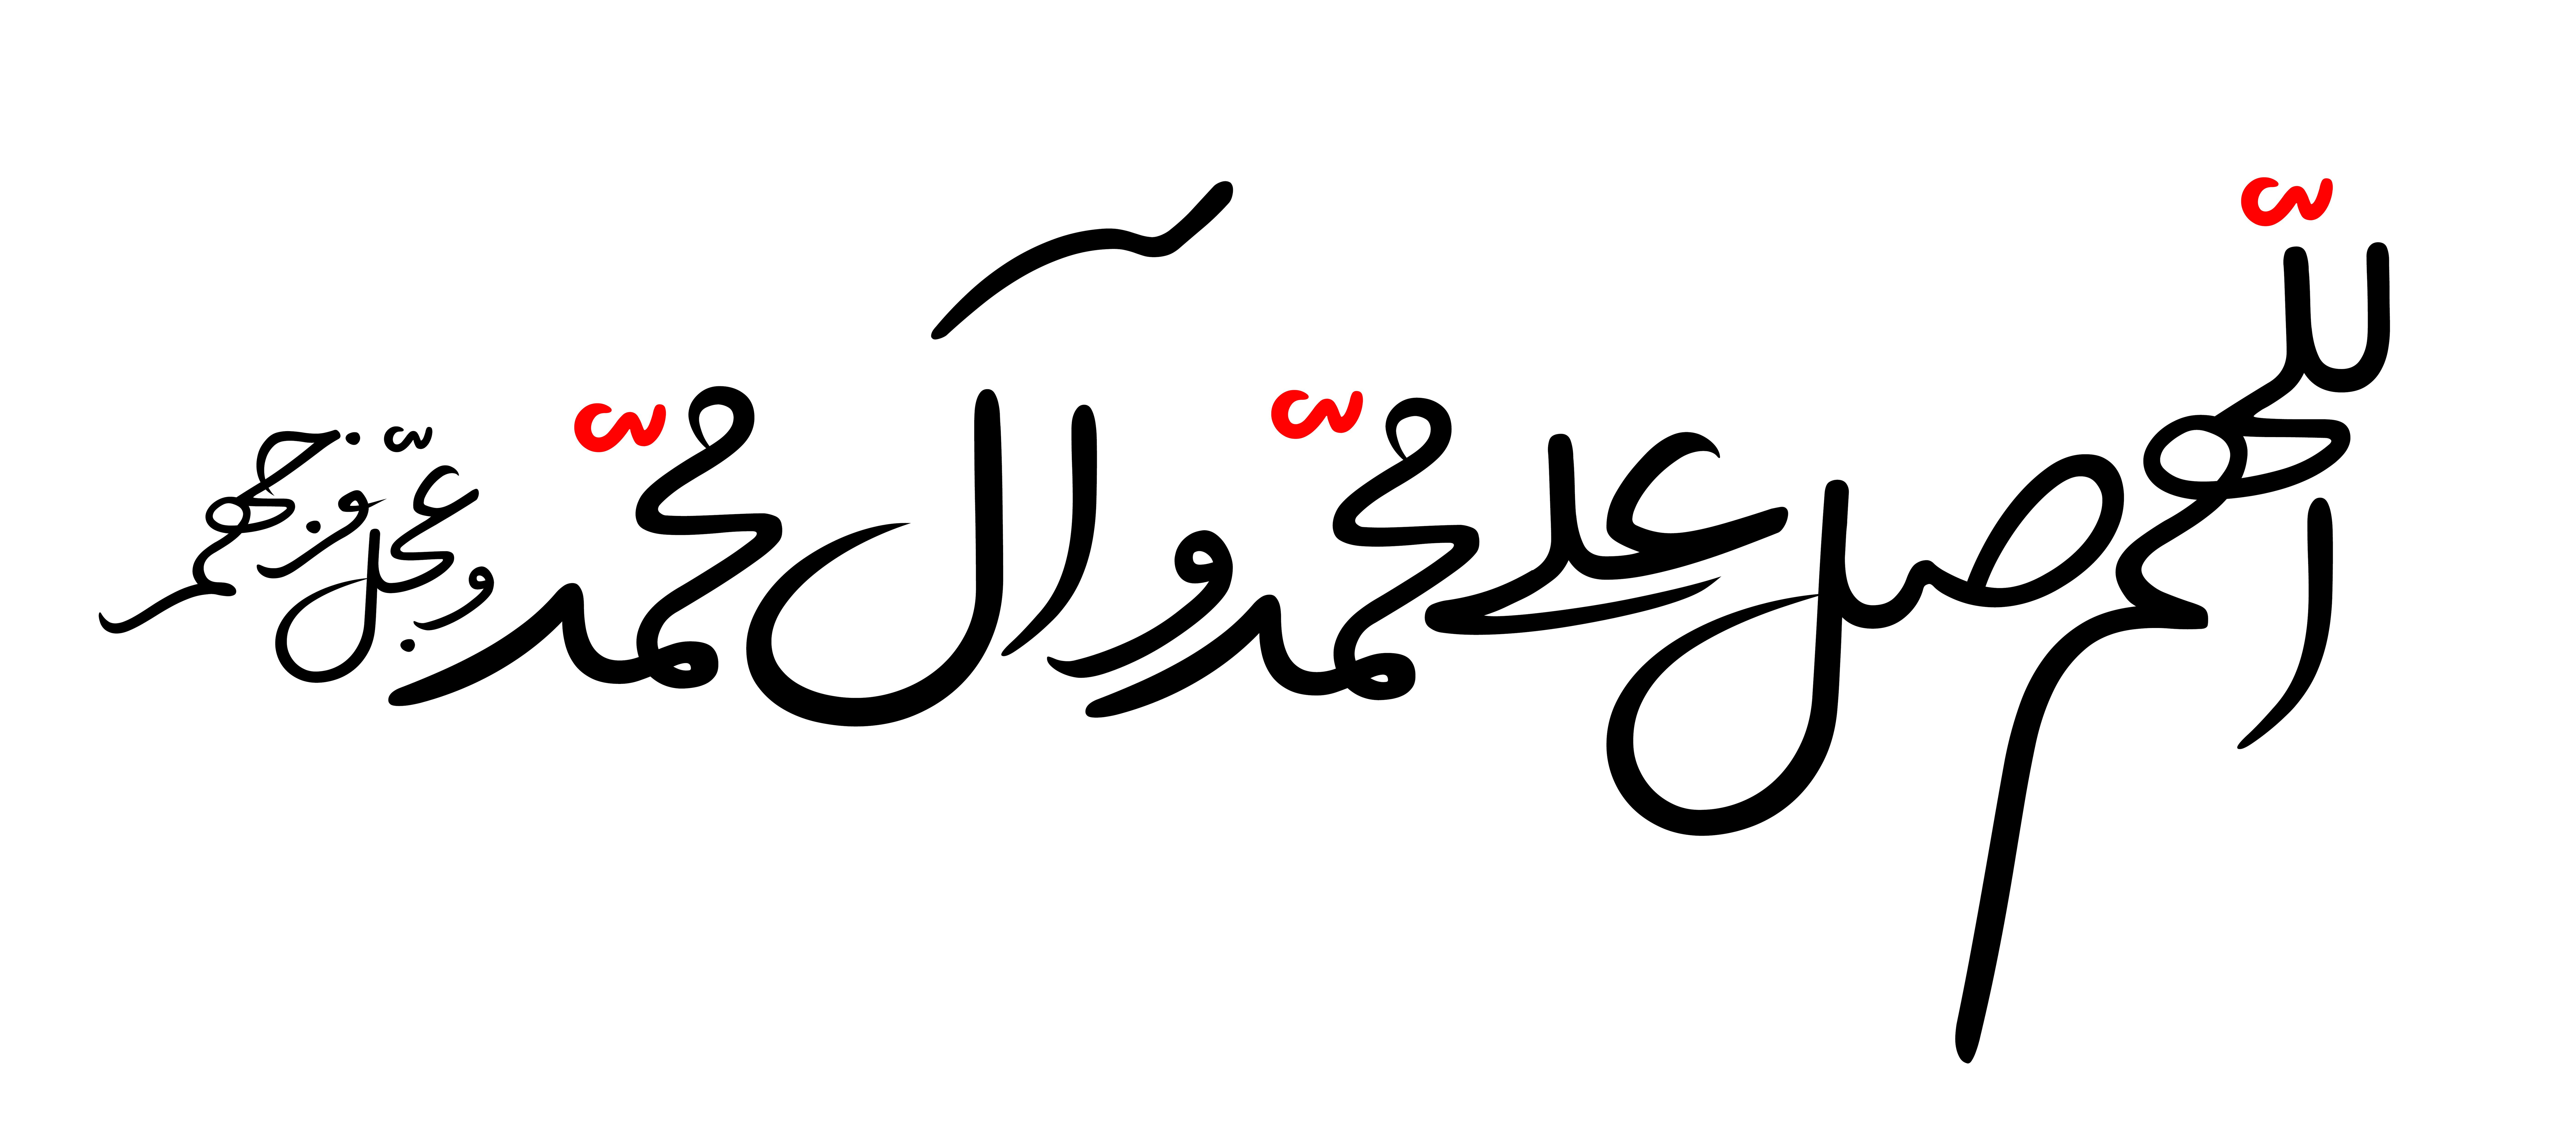 بر آستانه سبز صلوات بر محمد و آل محمد ((بياتو؛ يك صلوات بفرست))